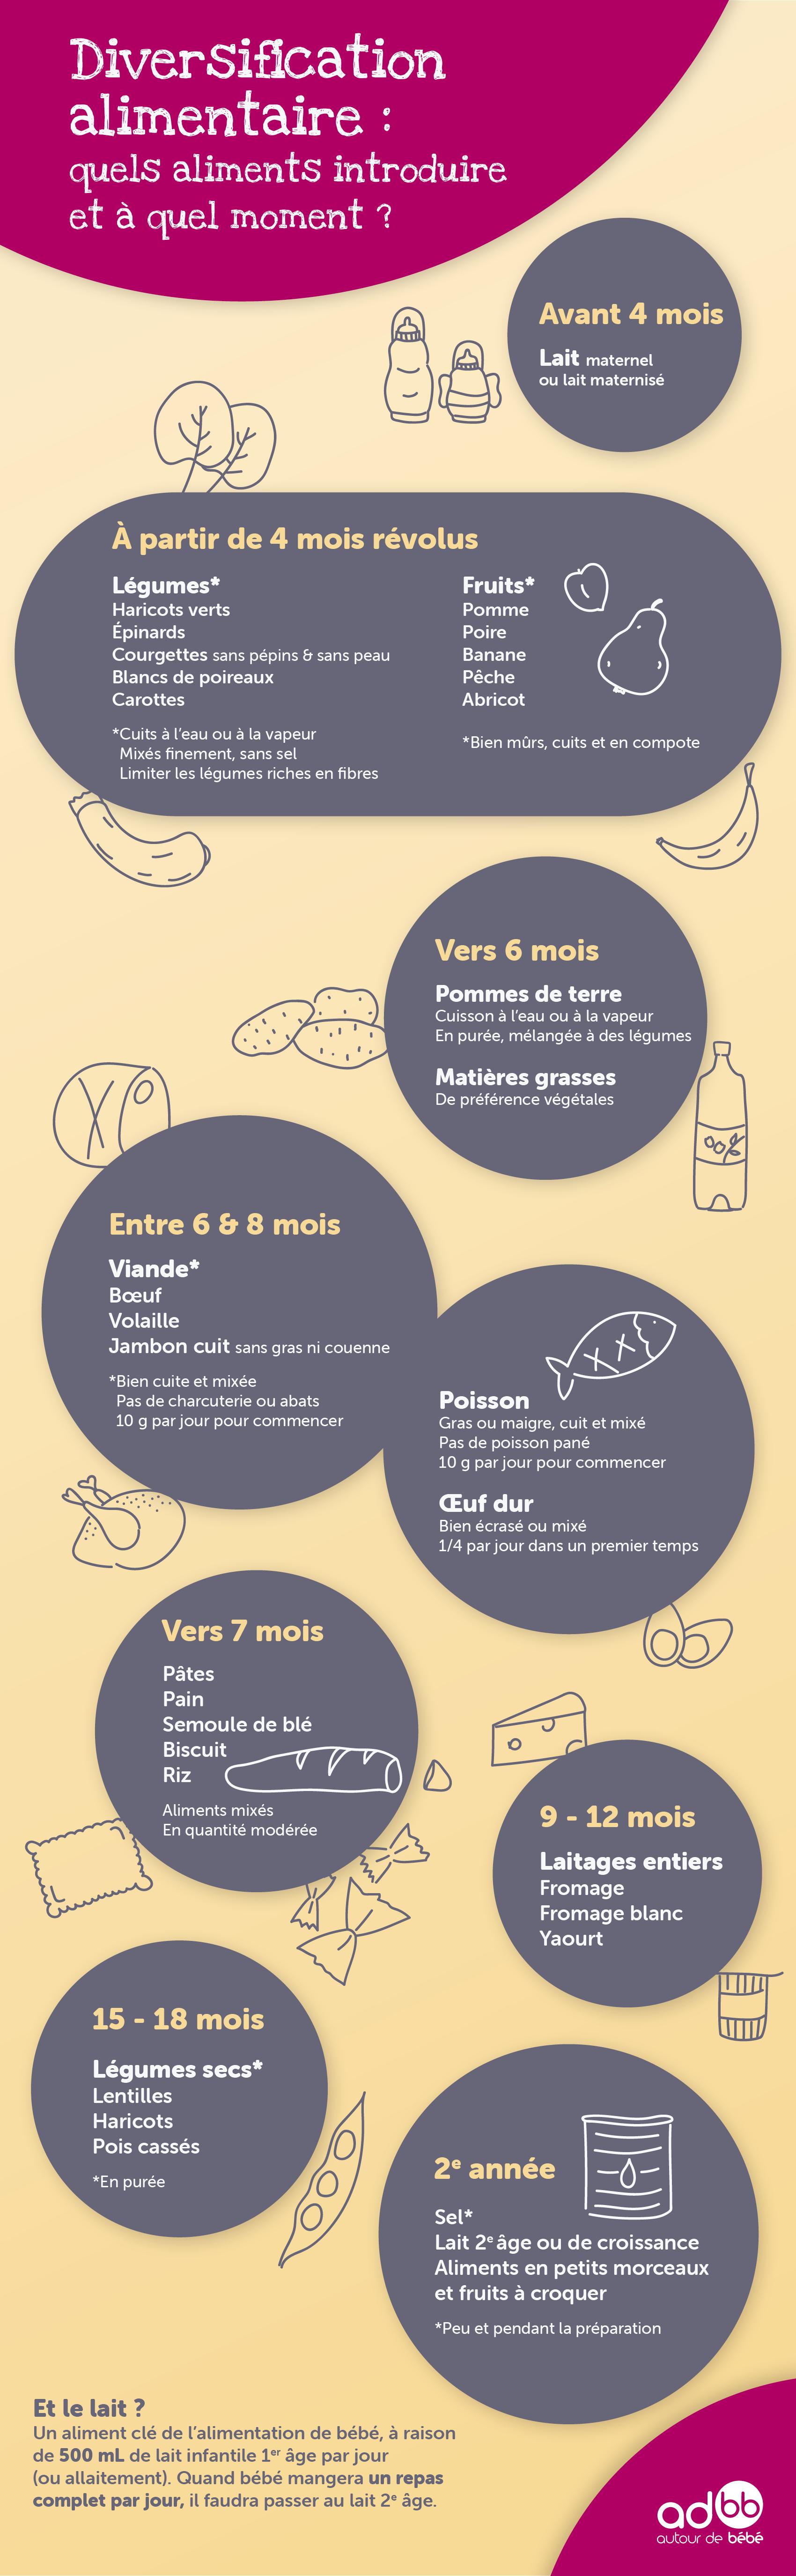 INFO_Diversification alimentaire